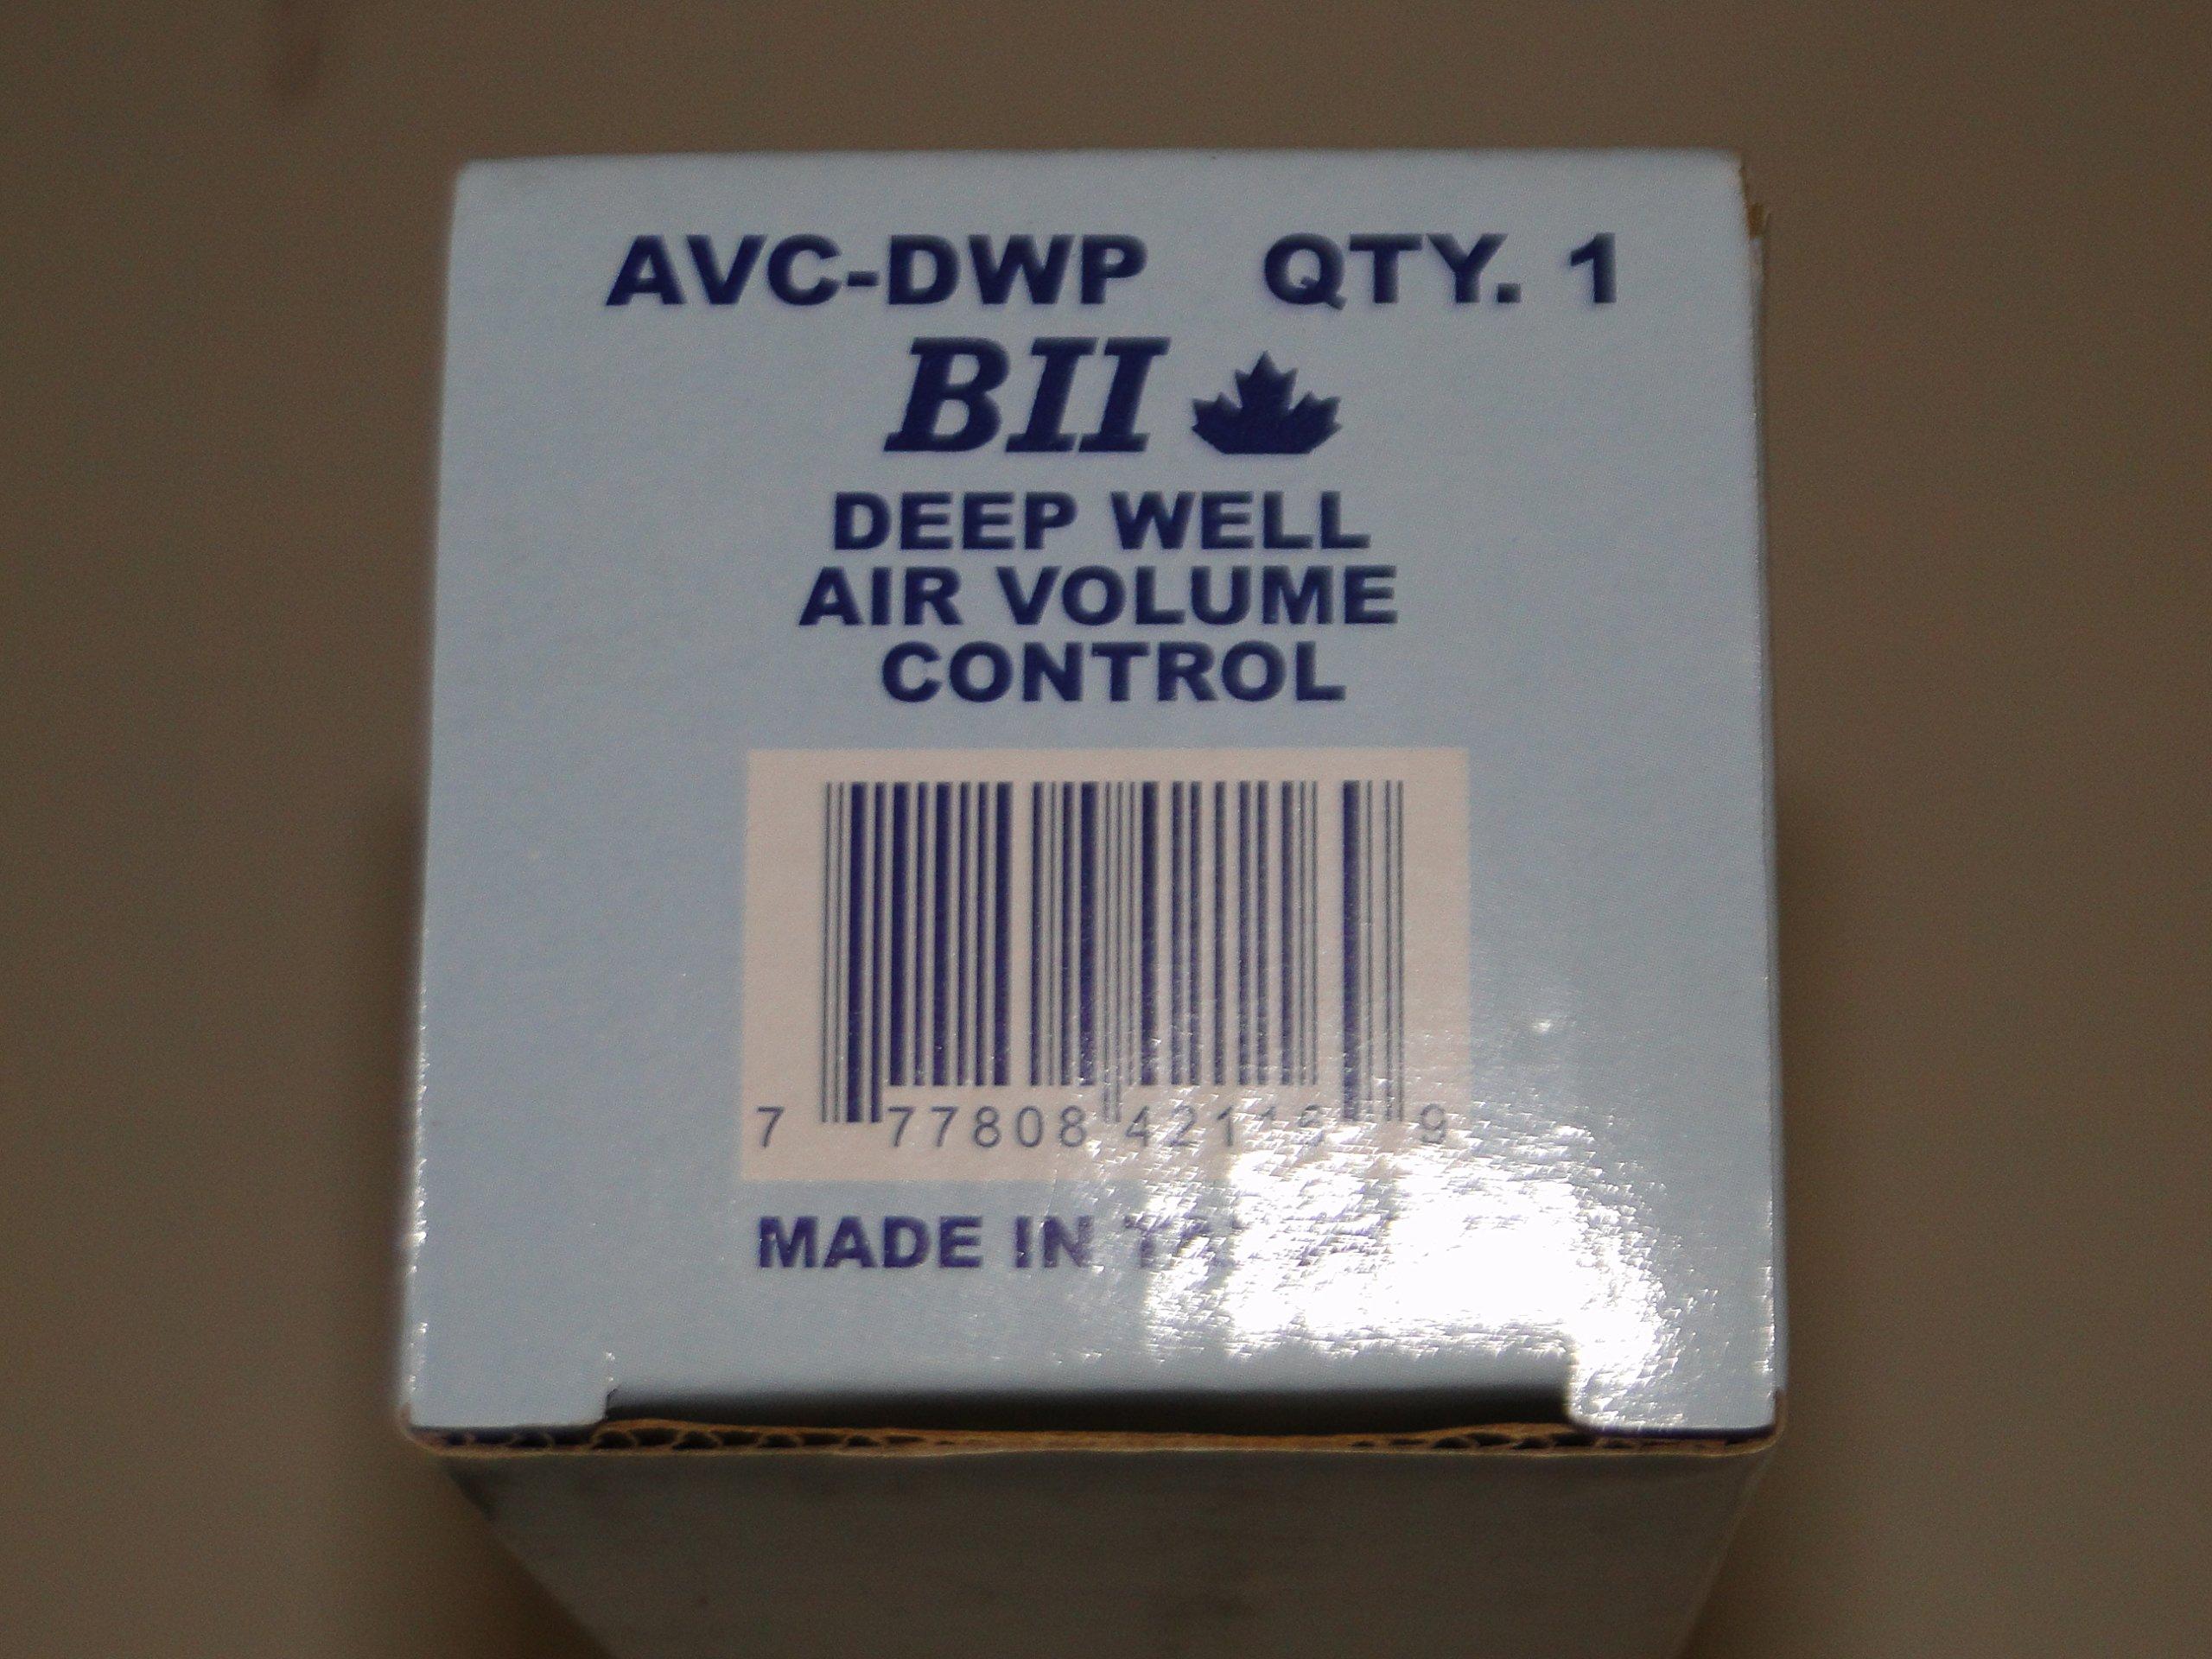 BOSHART BII BRAND DEEP WELL AIR VOLUME CONTROL (AVC-DWP) AIR RELEASE VALVE FLOAT-TYPE